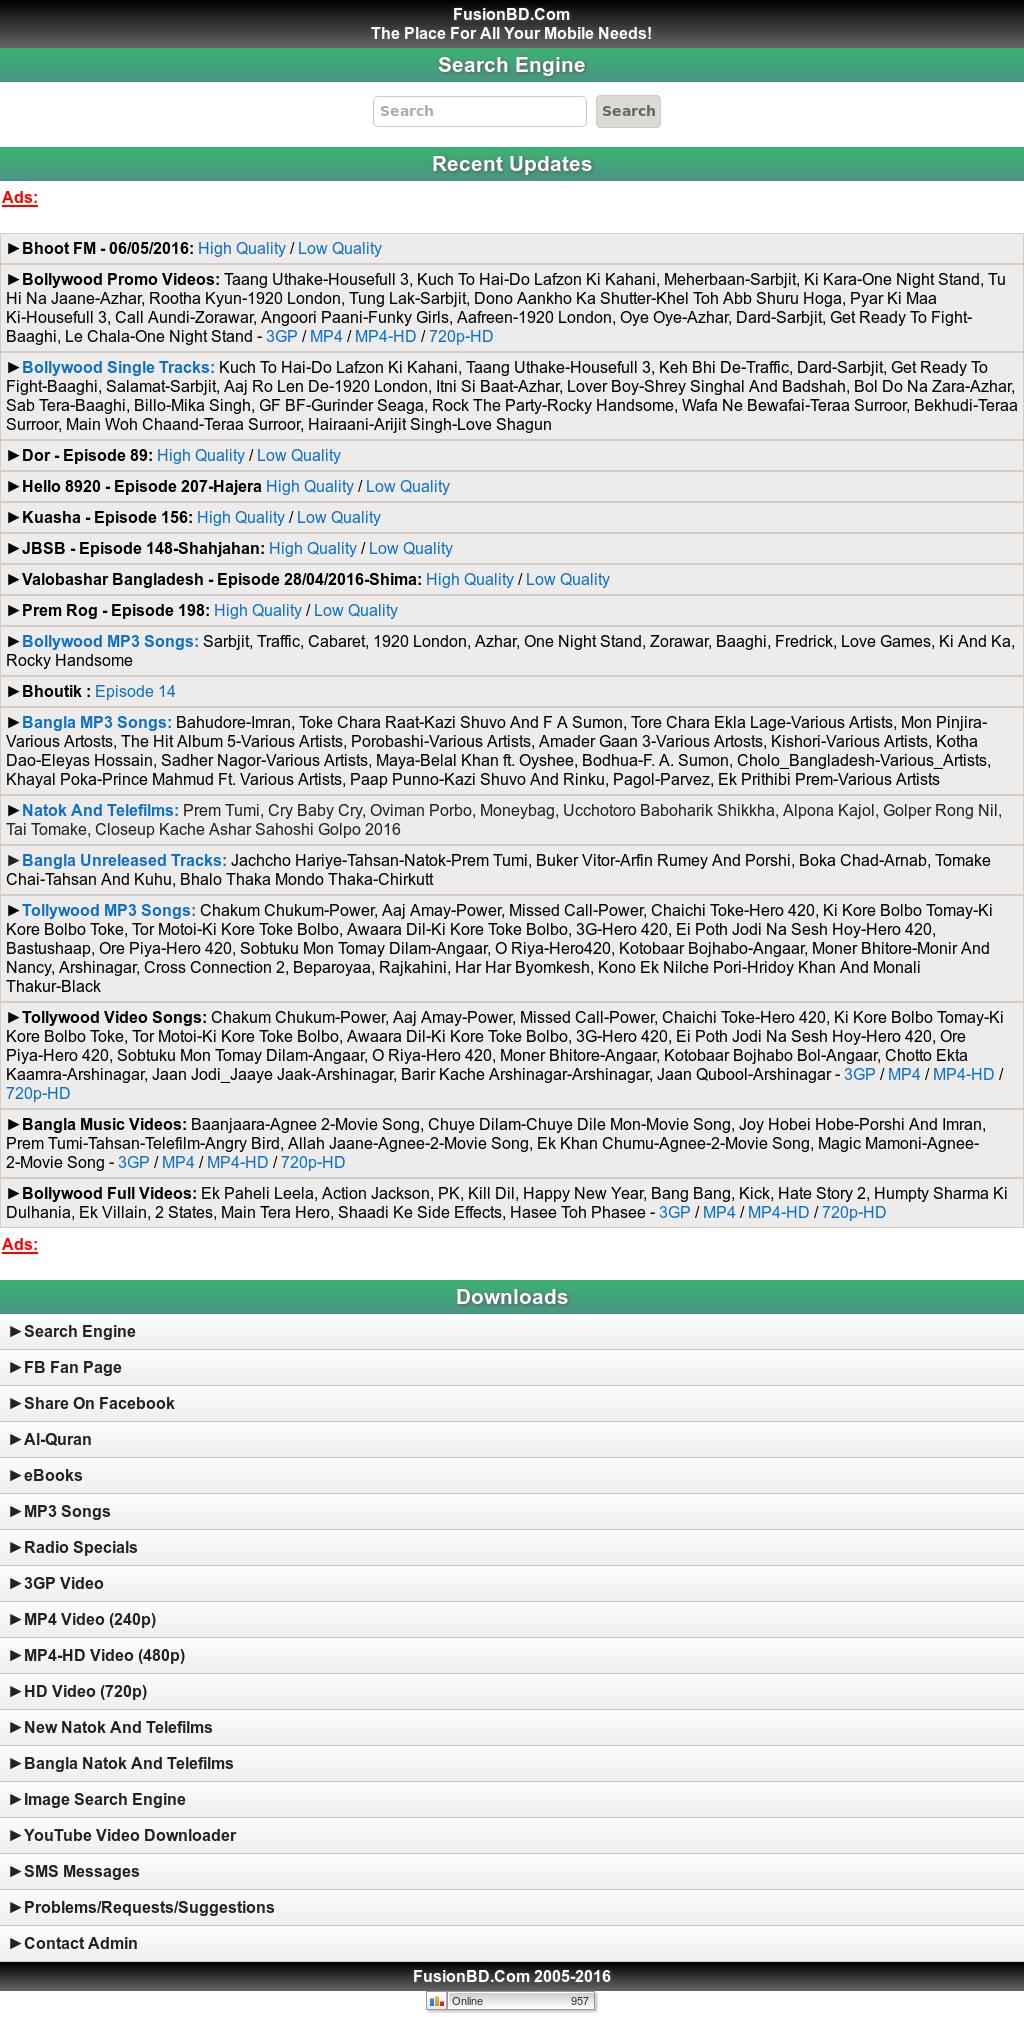 Bhoot Fm 2015 Fusionbd com (Mountain Shadow Gallery)